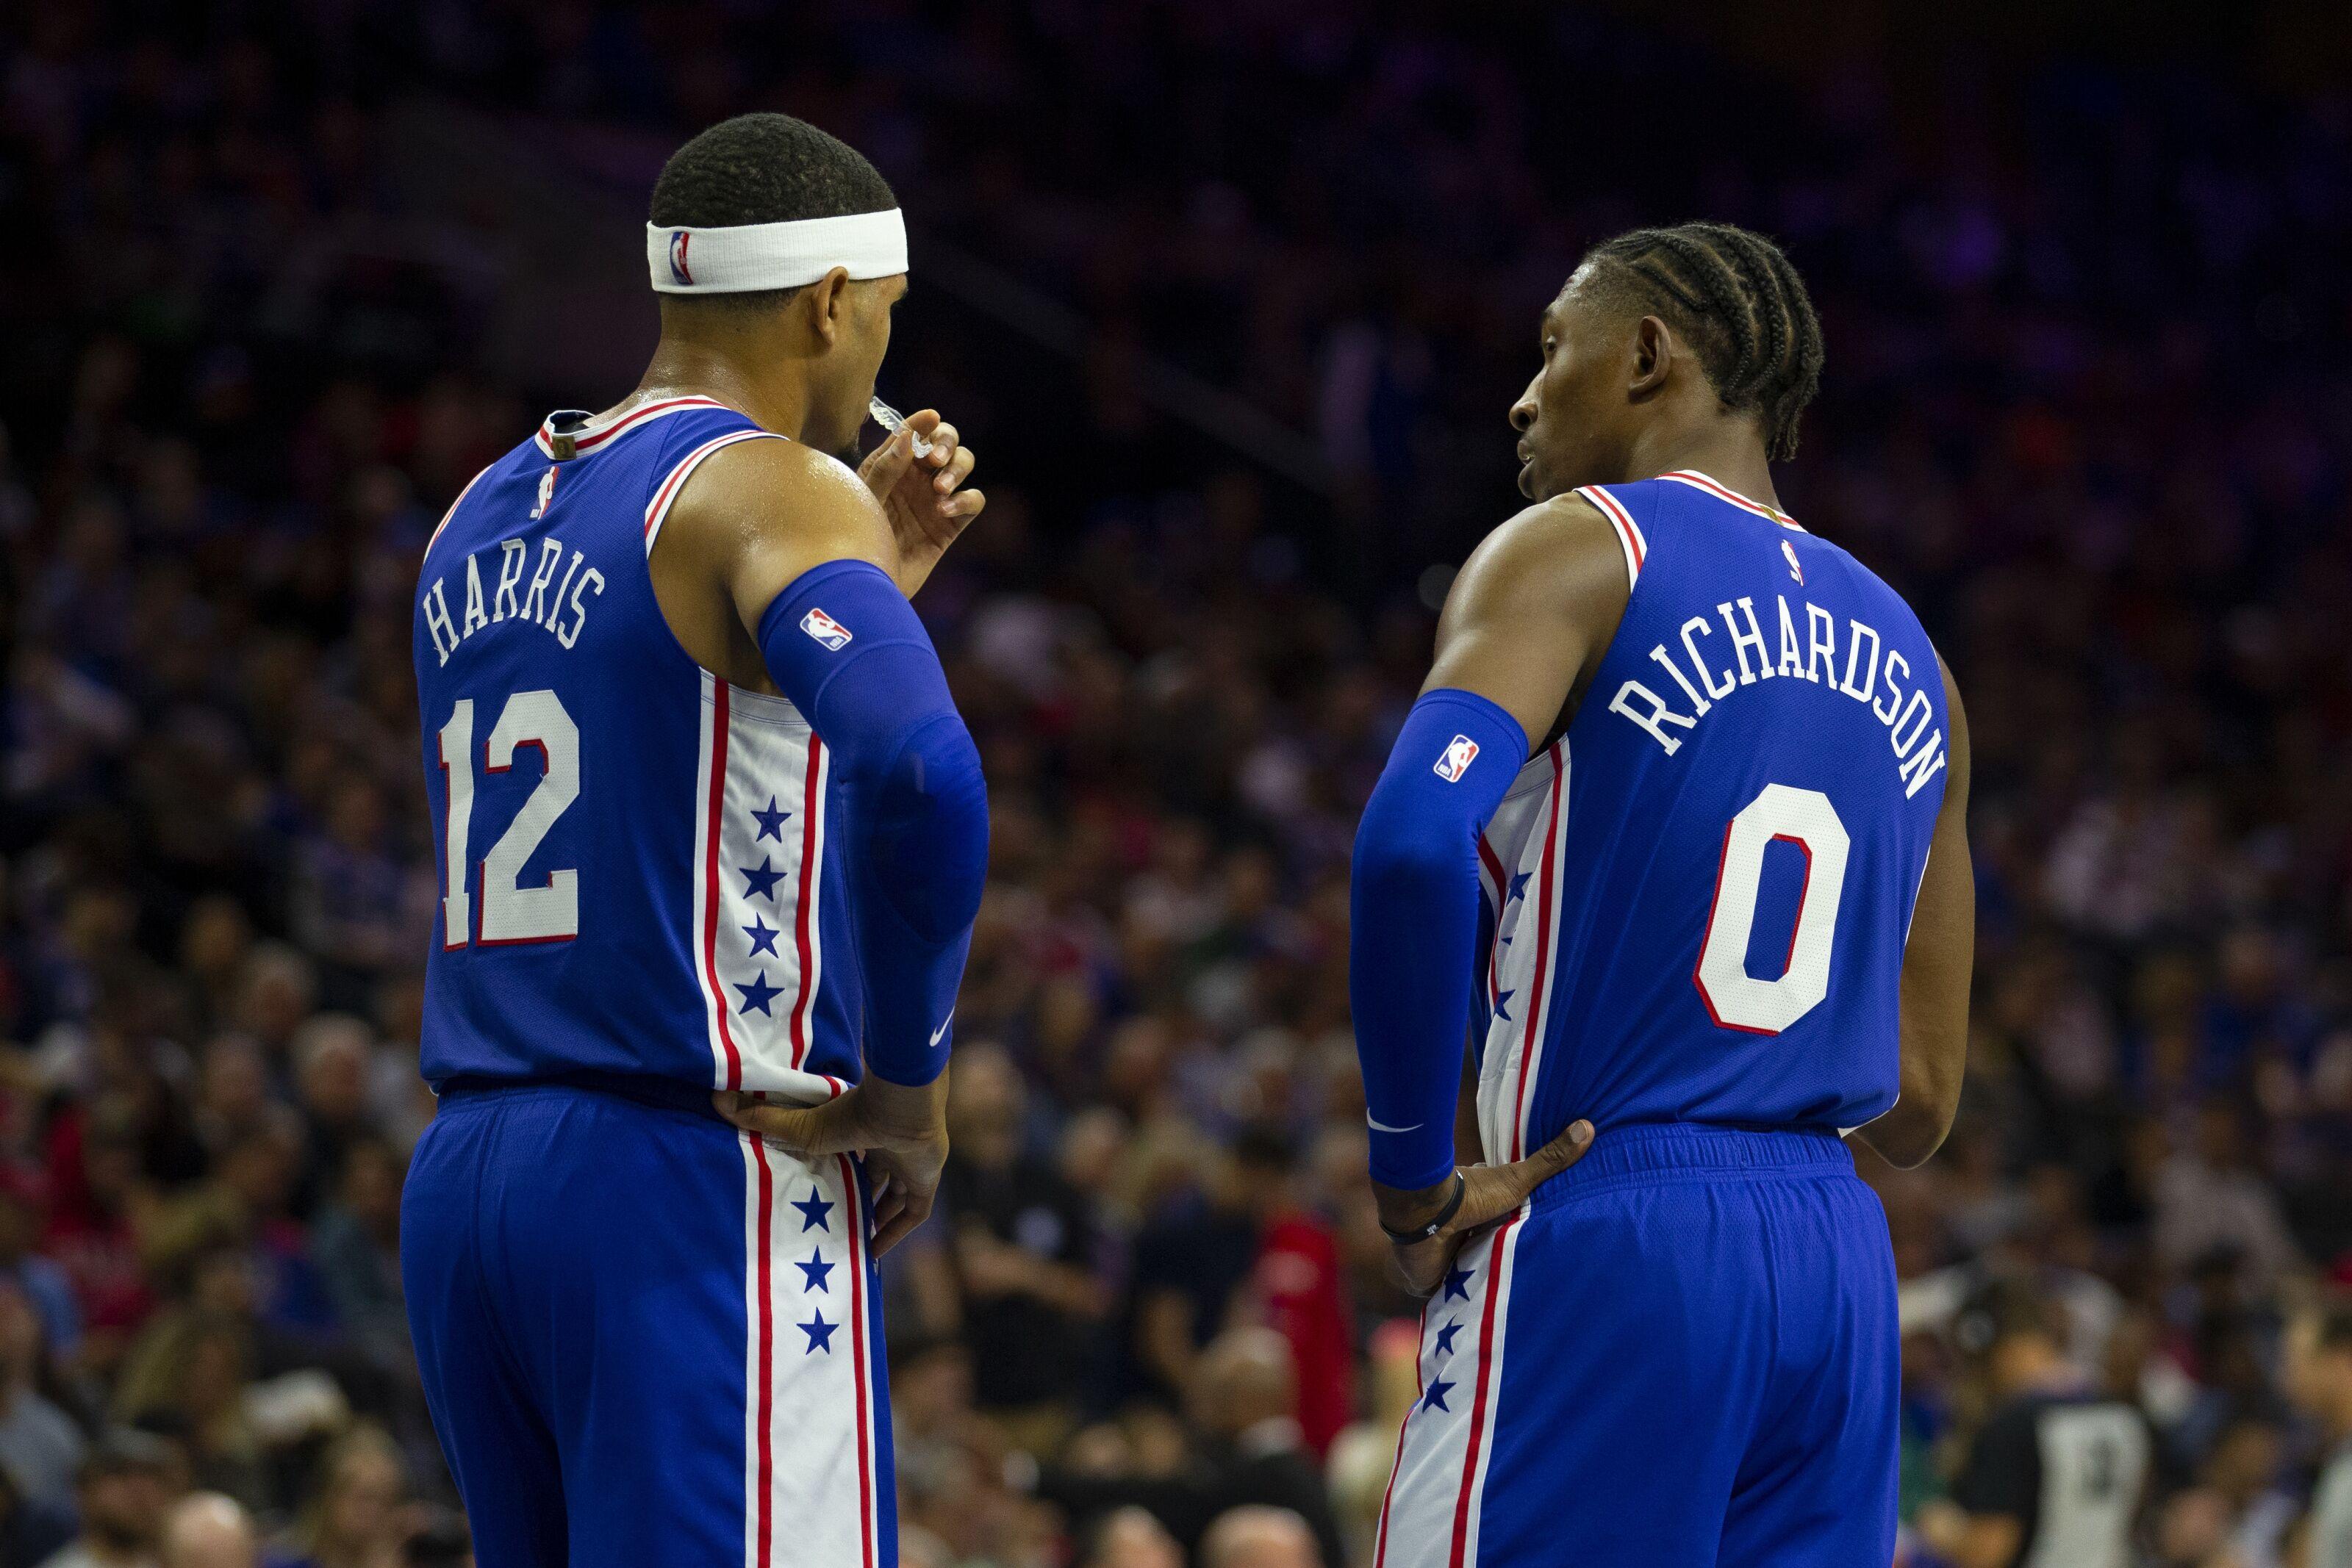 Philadelphia 76ers need someone to emerge as a reliable shot creator